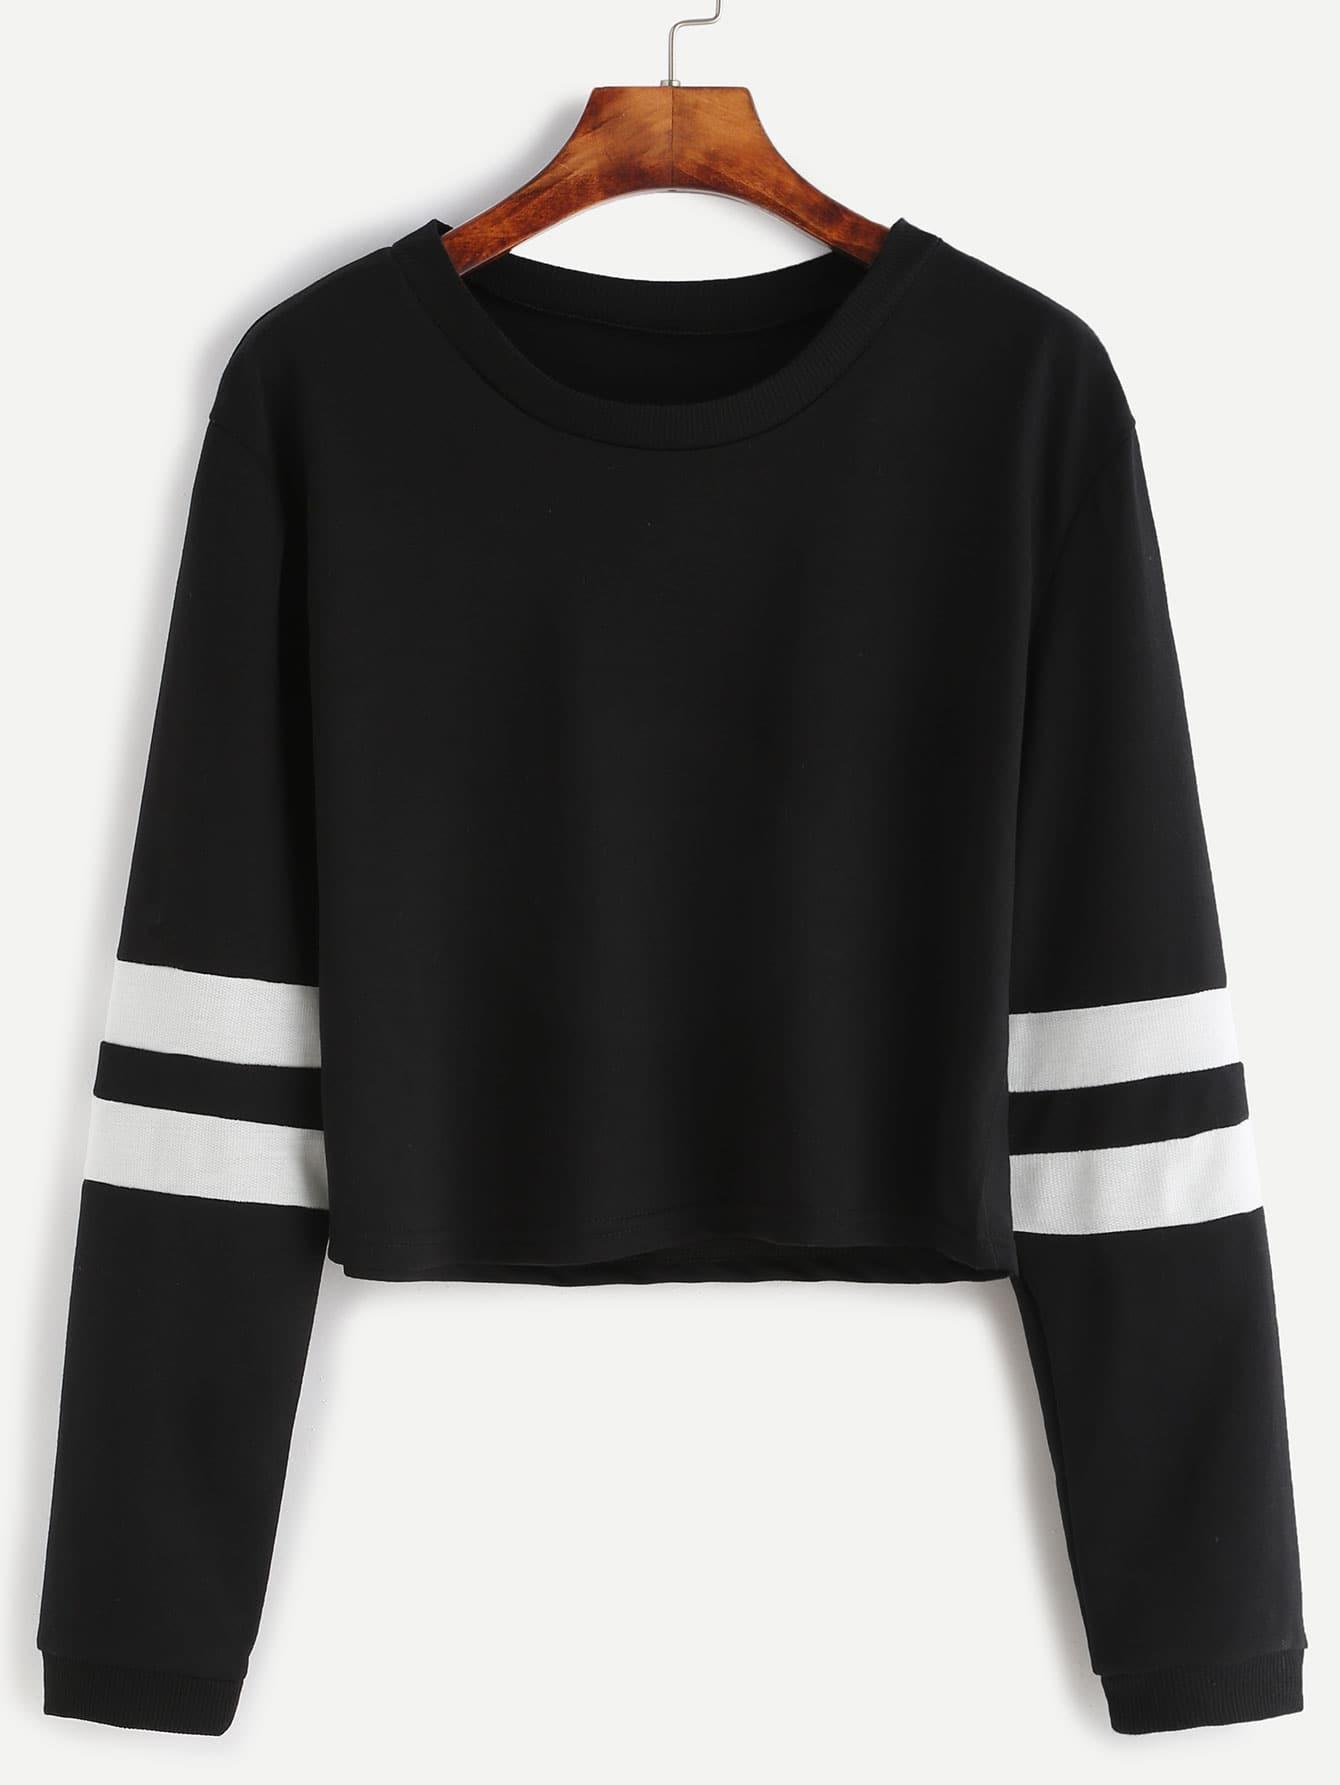 Black varsity striped sleeve crop t shirt emmacloth women for Black sweater white shirt